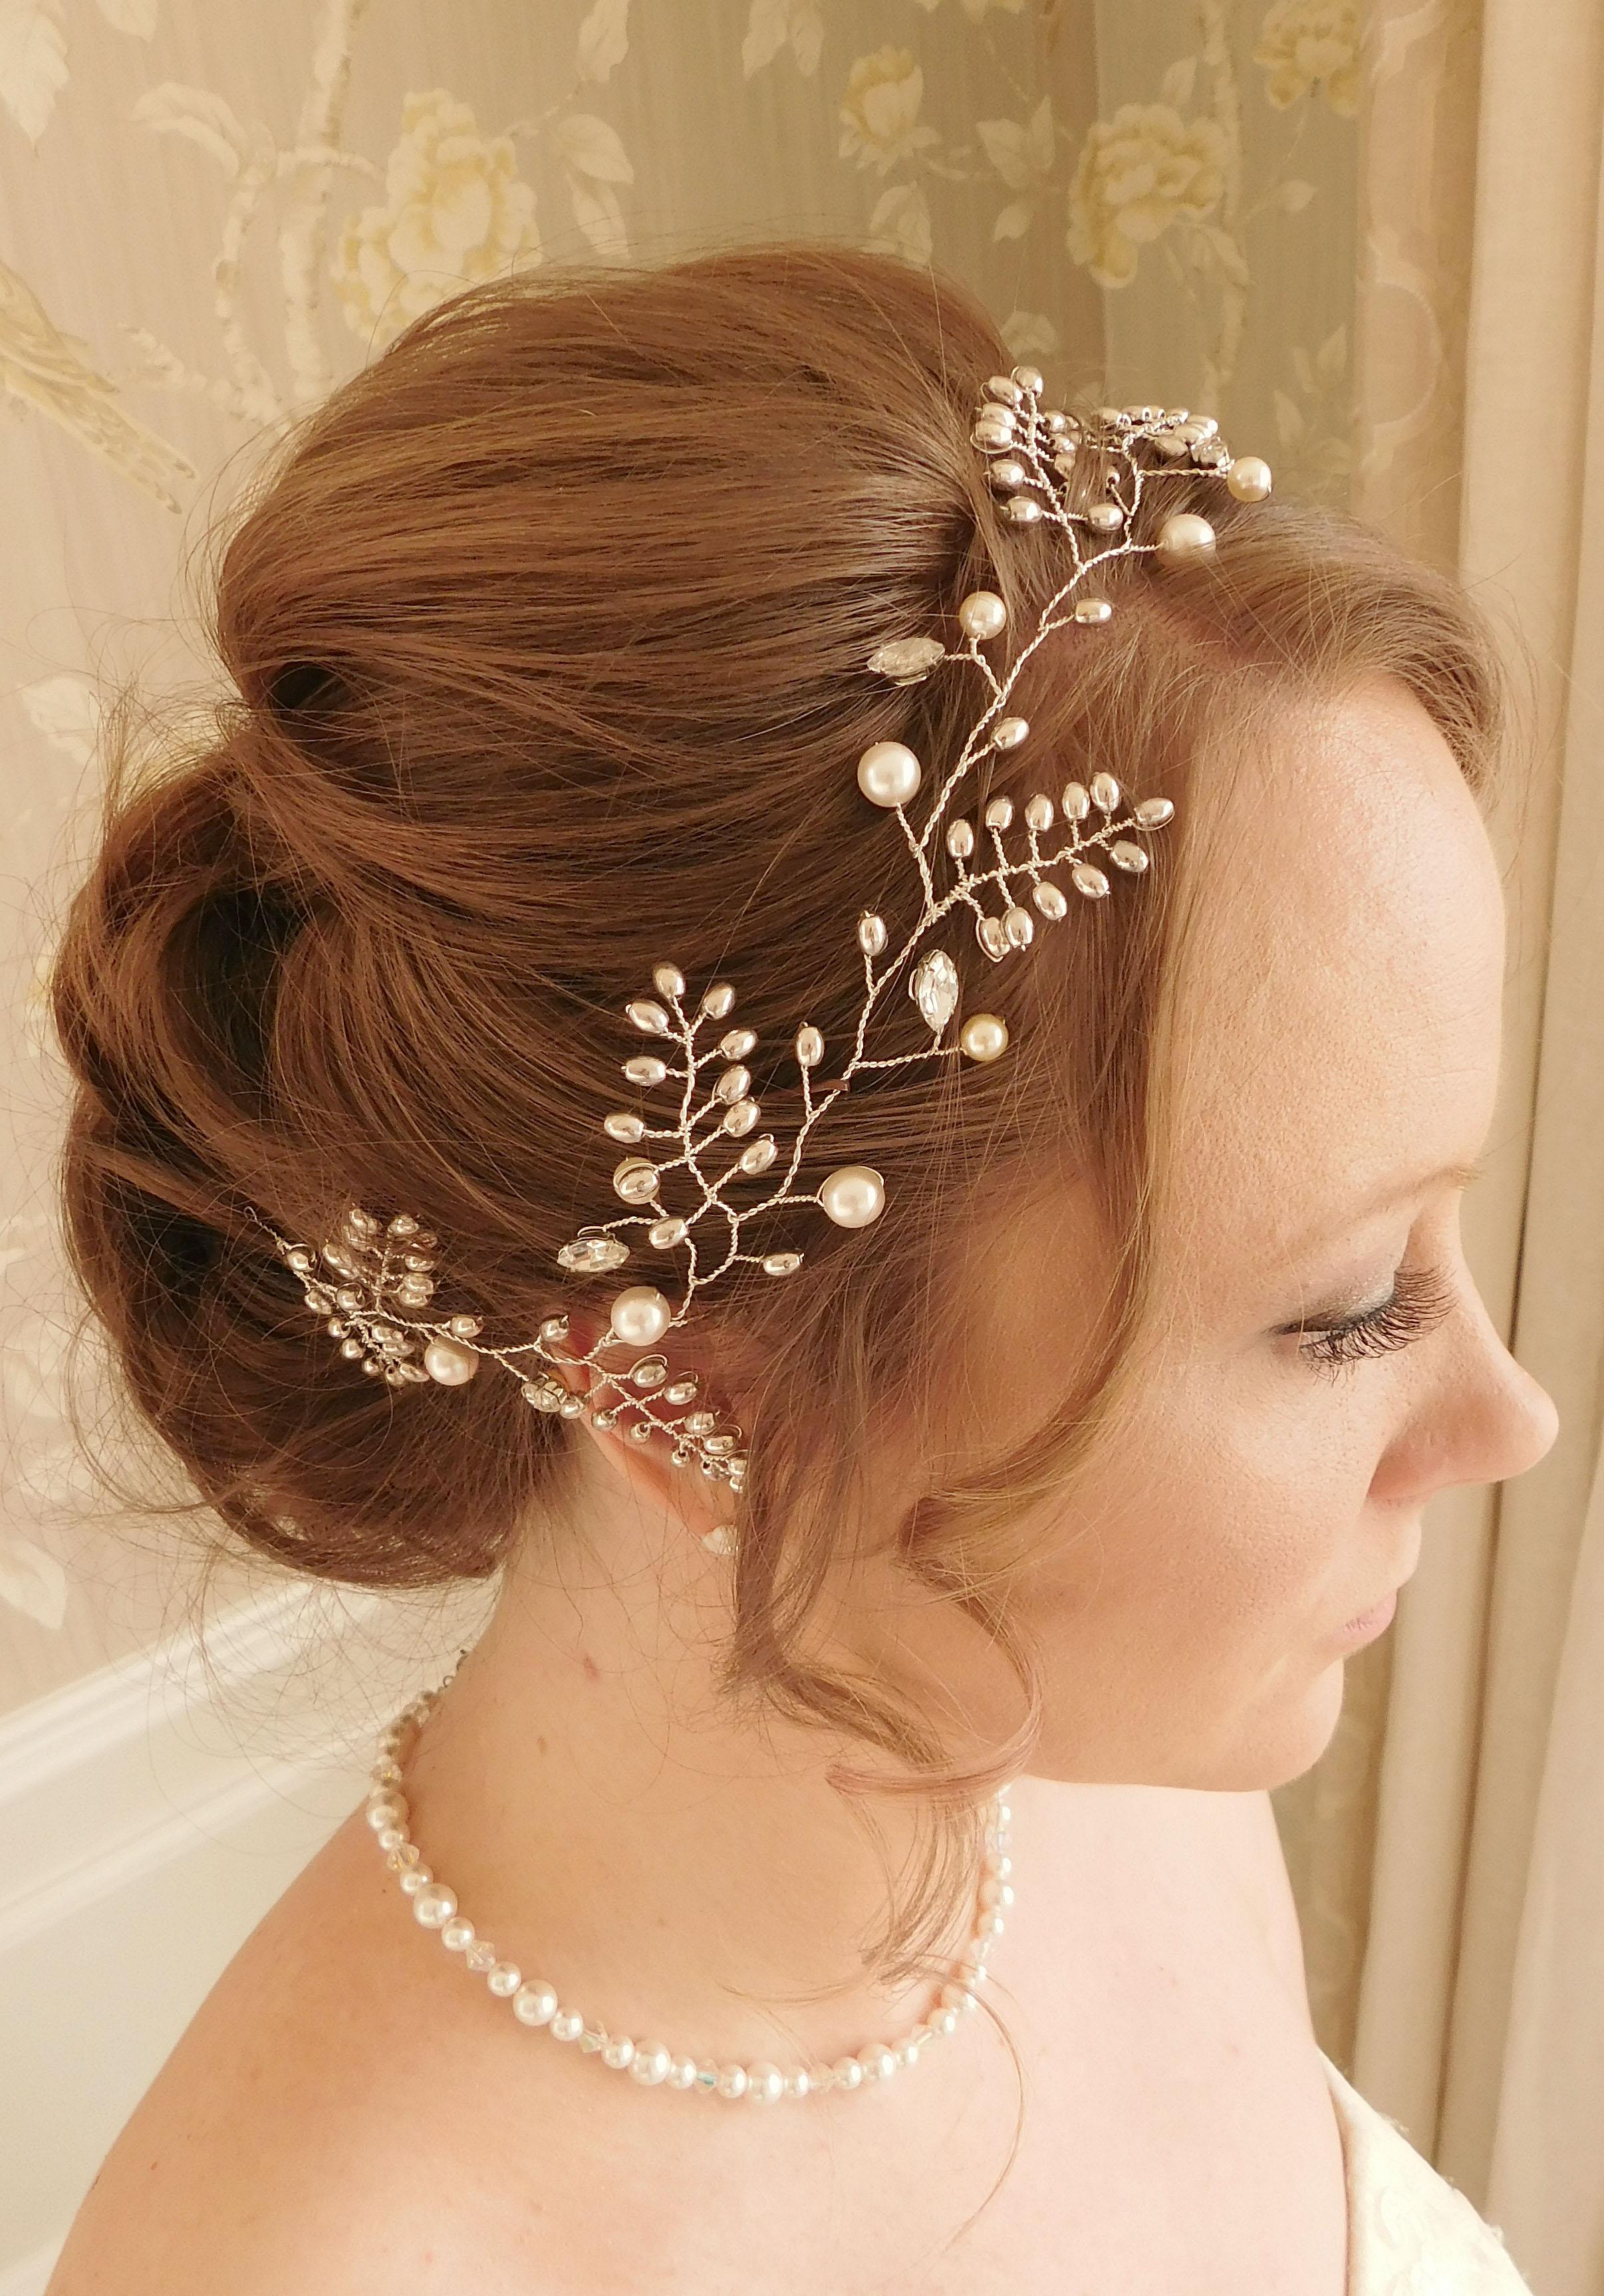 """ Elizabeth hair vine "", worn to the side"